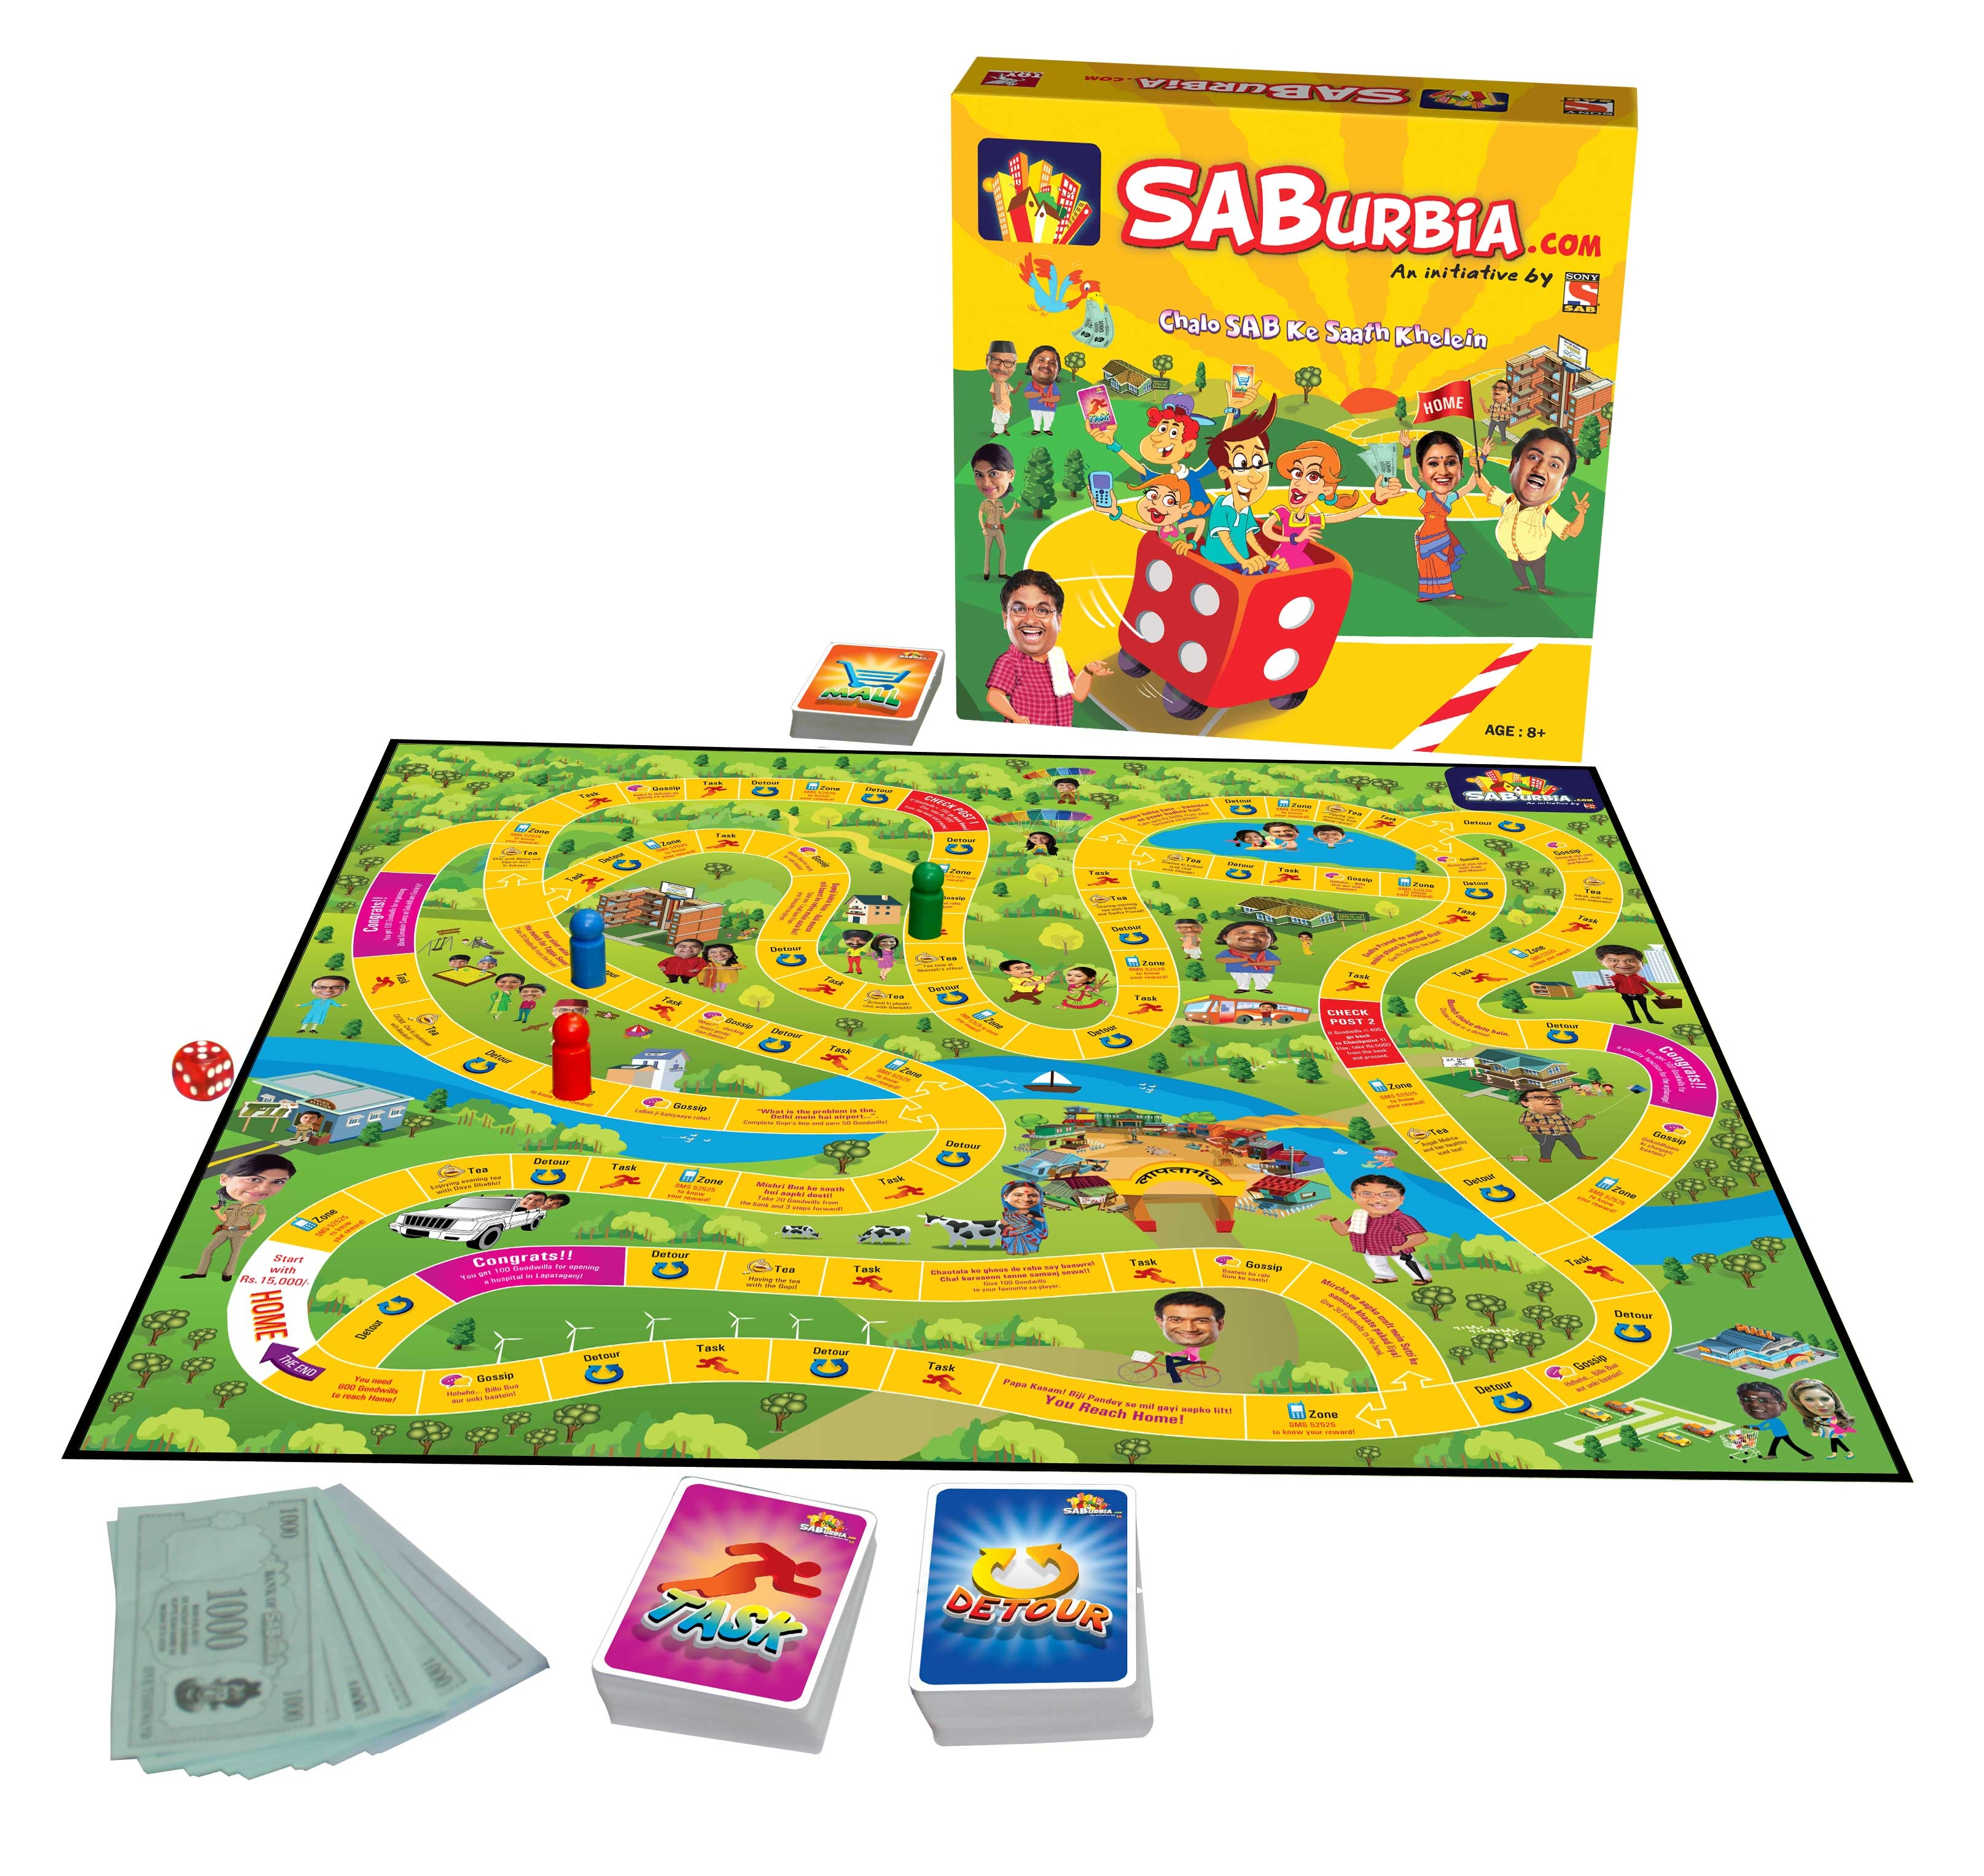 Sab tv board game